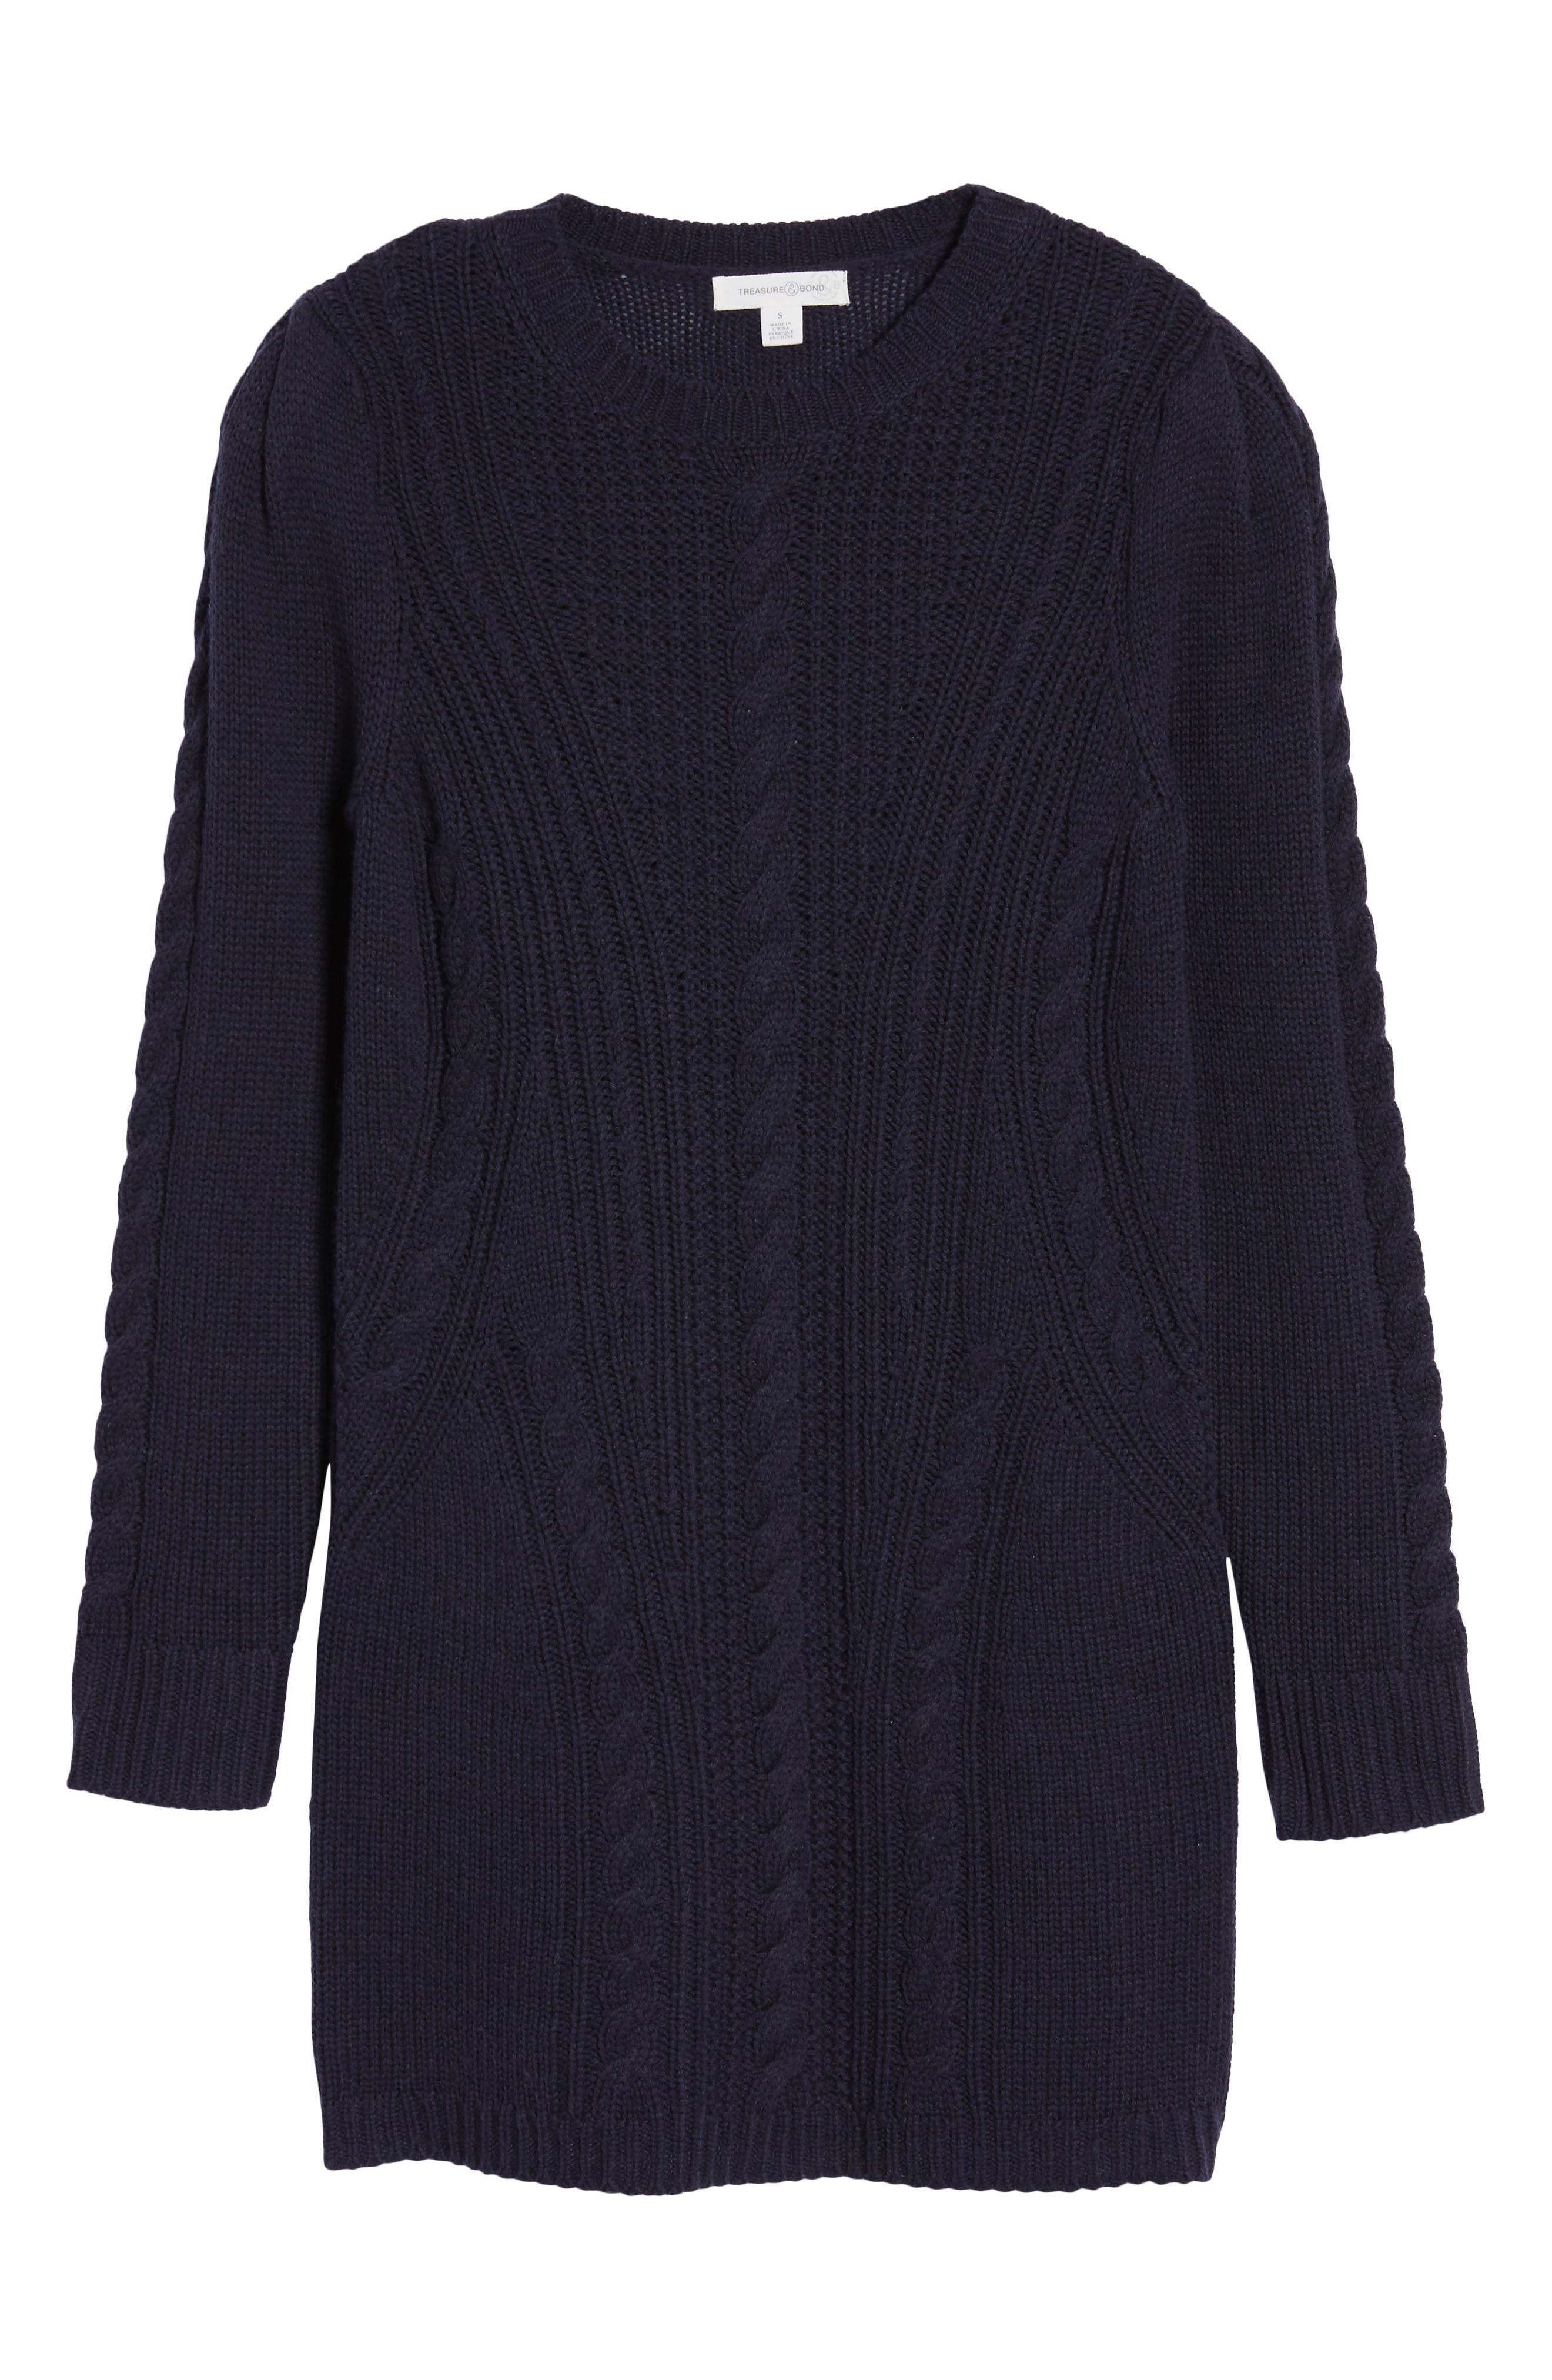 x Something Navy Sweater Dress,                             Alternate thumbnail 7, color,                             Navy Night